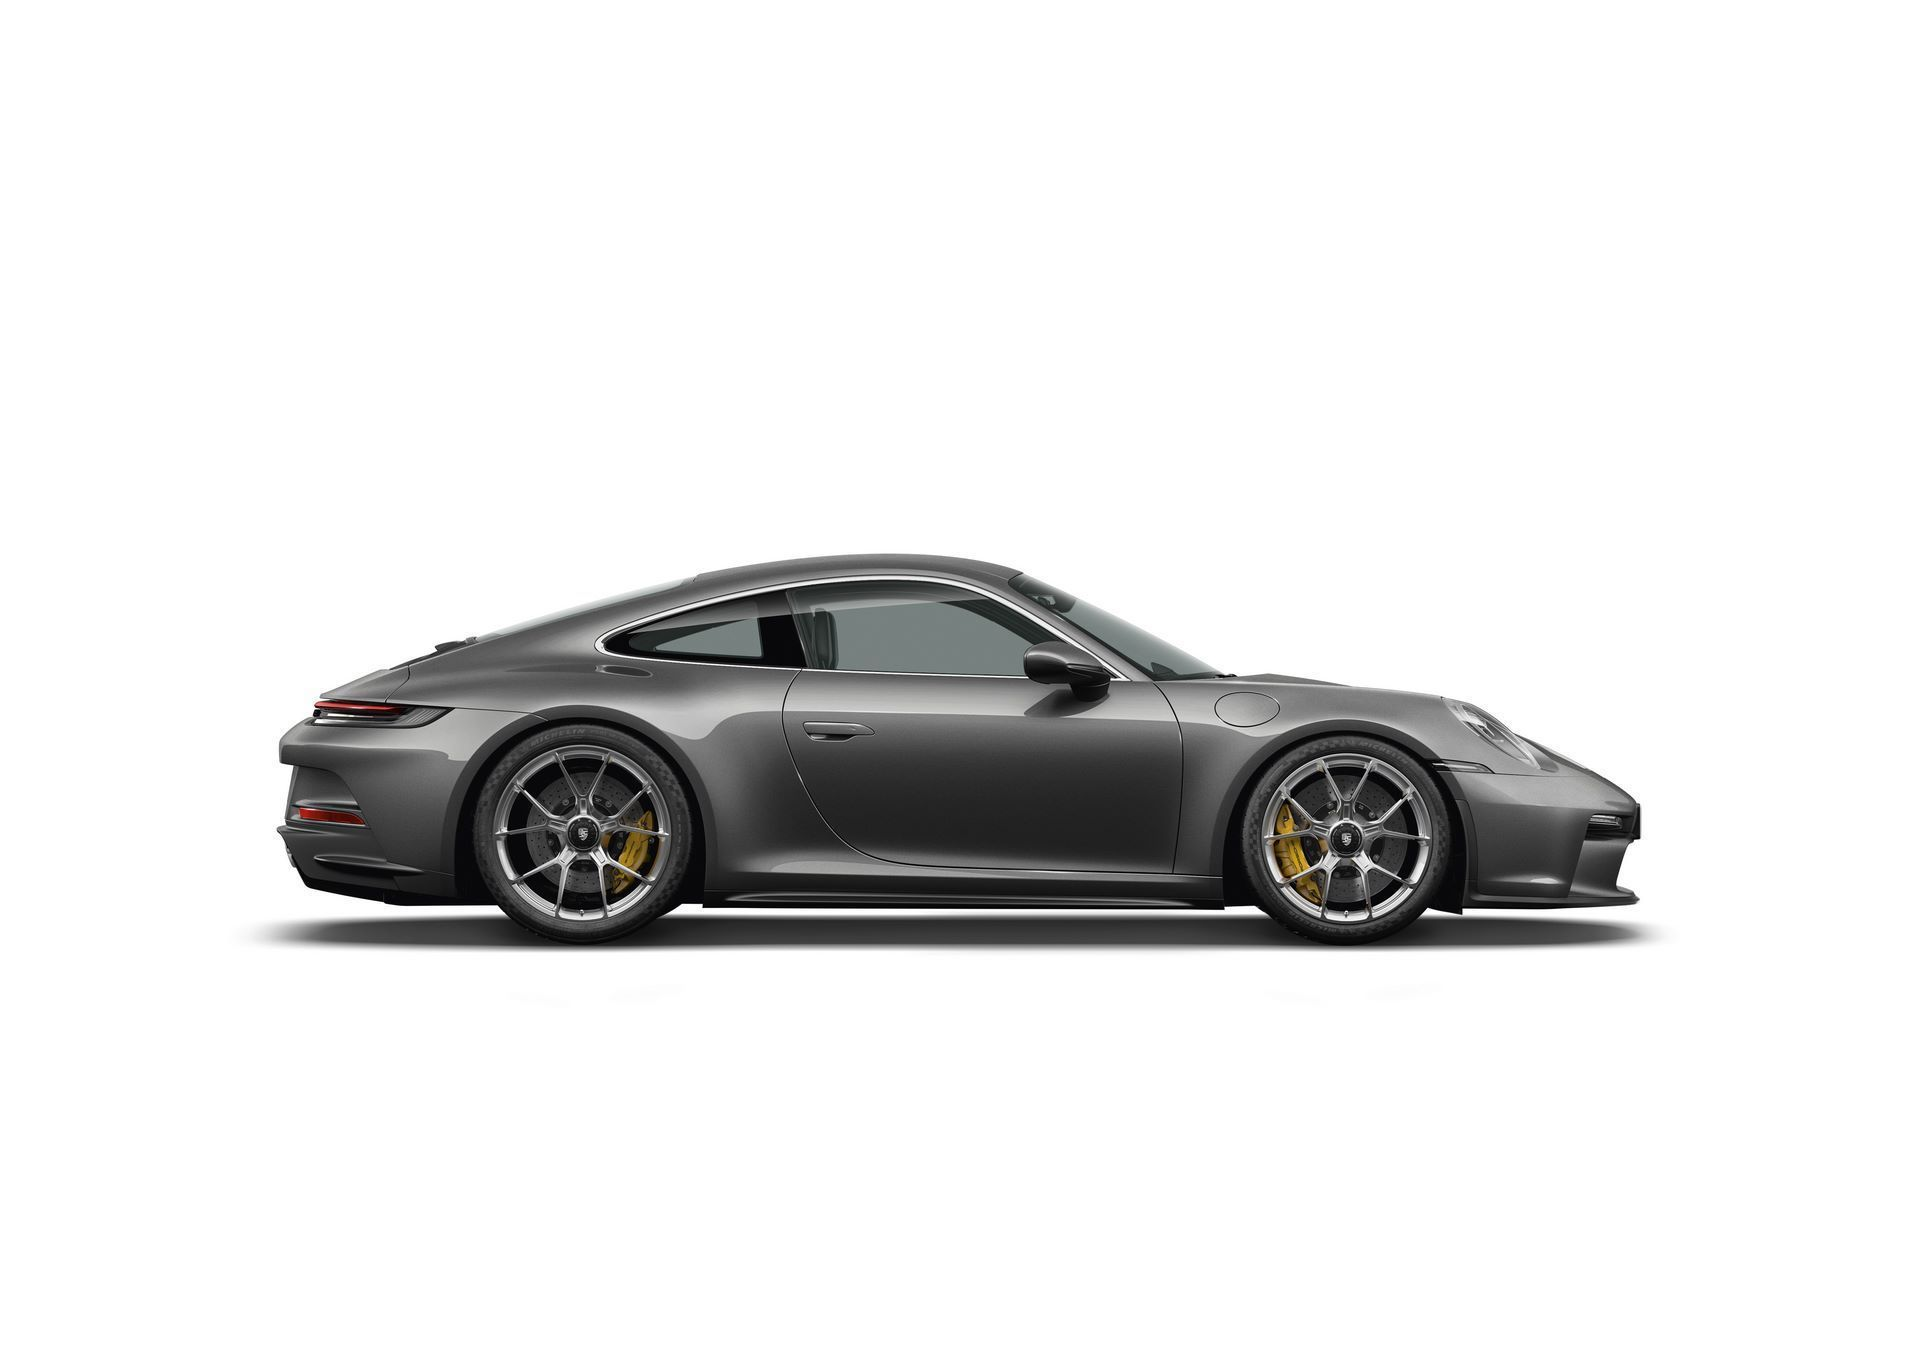 Porsche-911-GT3-Touring-Package-30